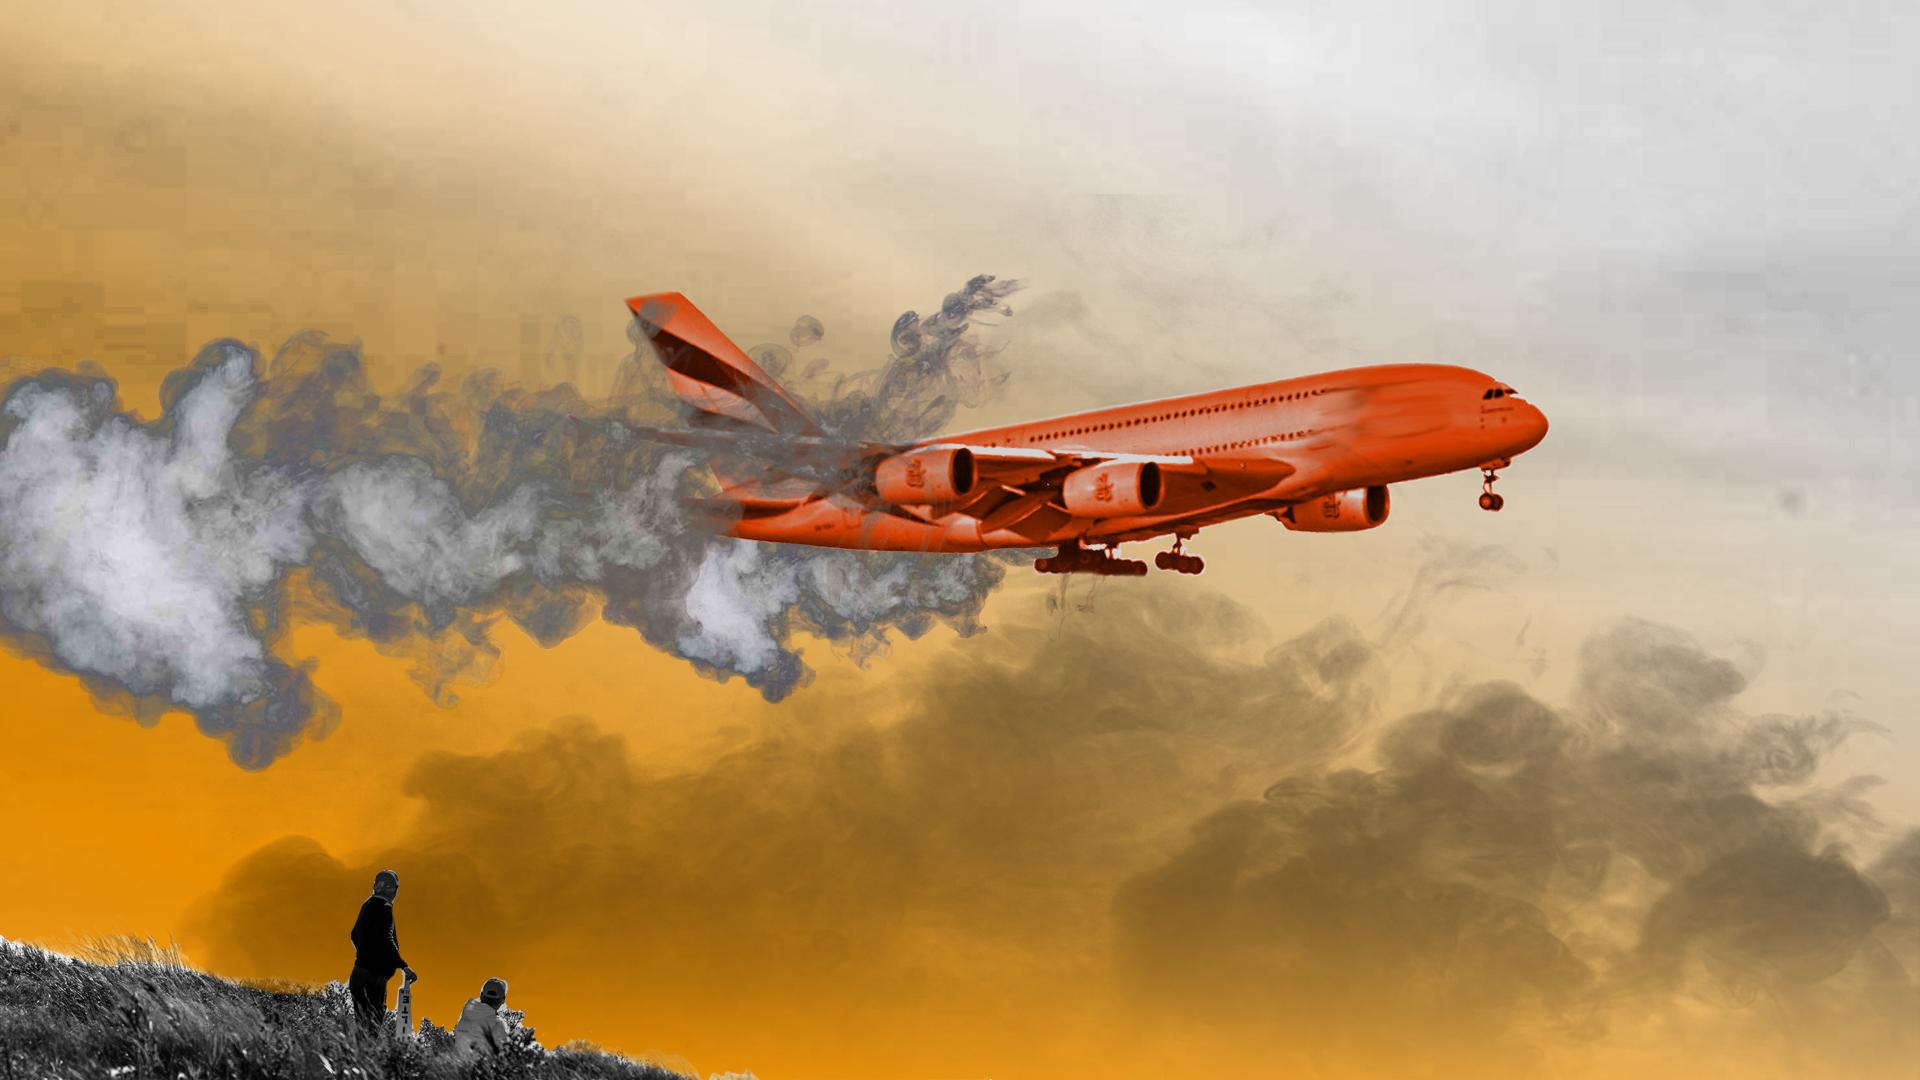 191210_vliegtuig_vervuiling_klimaat_vies_uitstoot